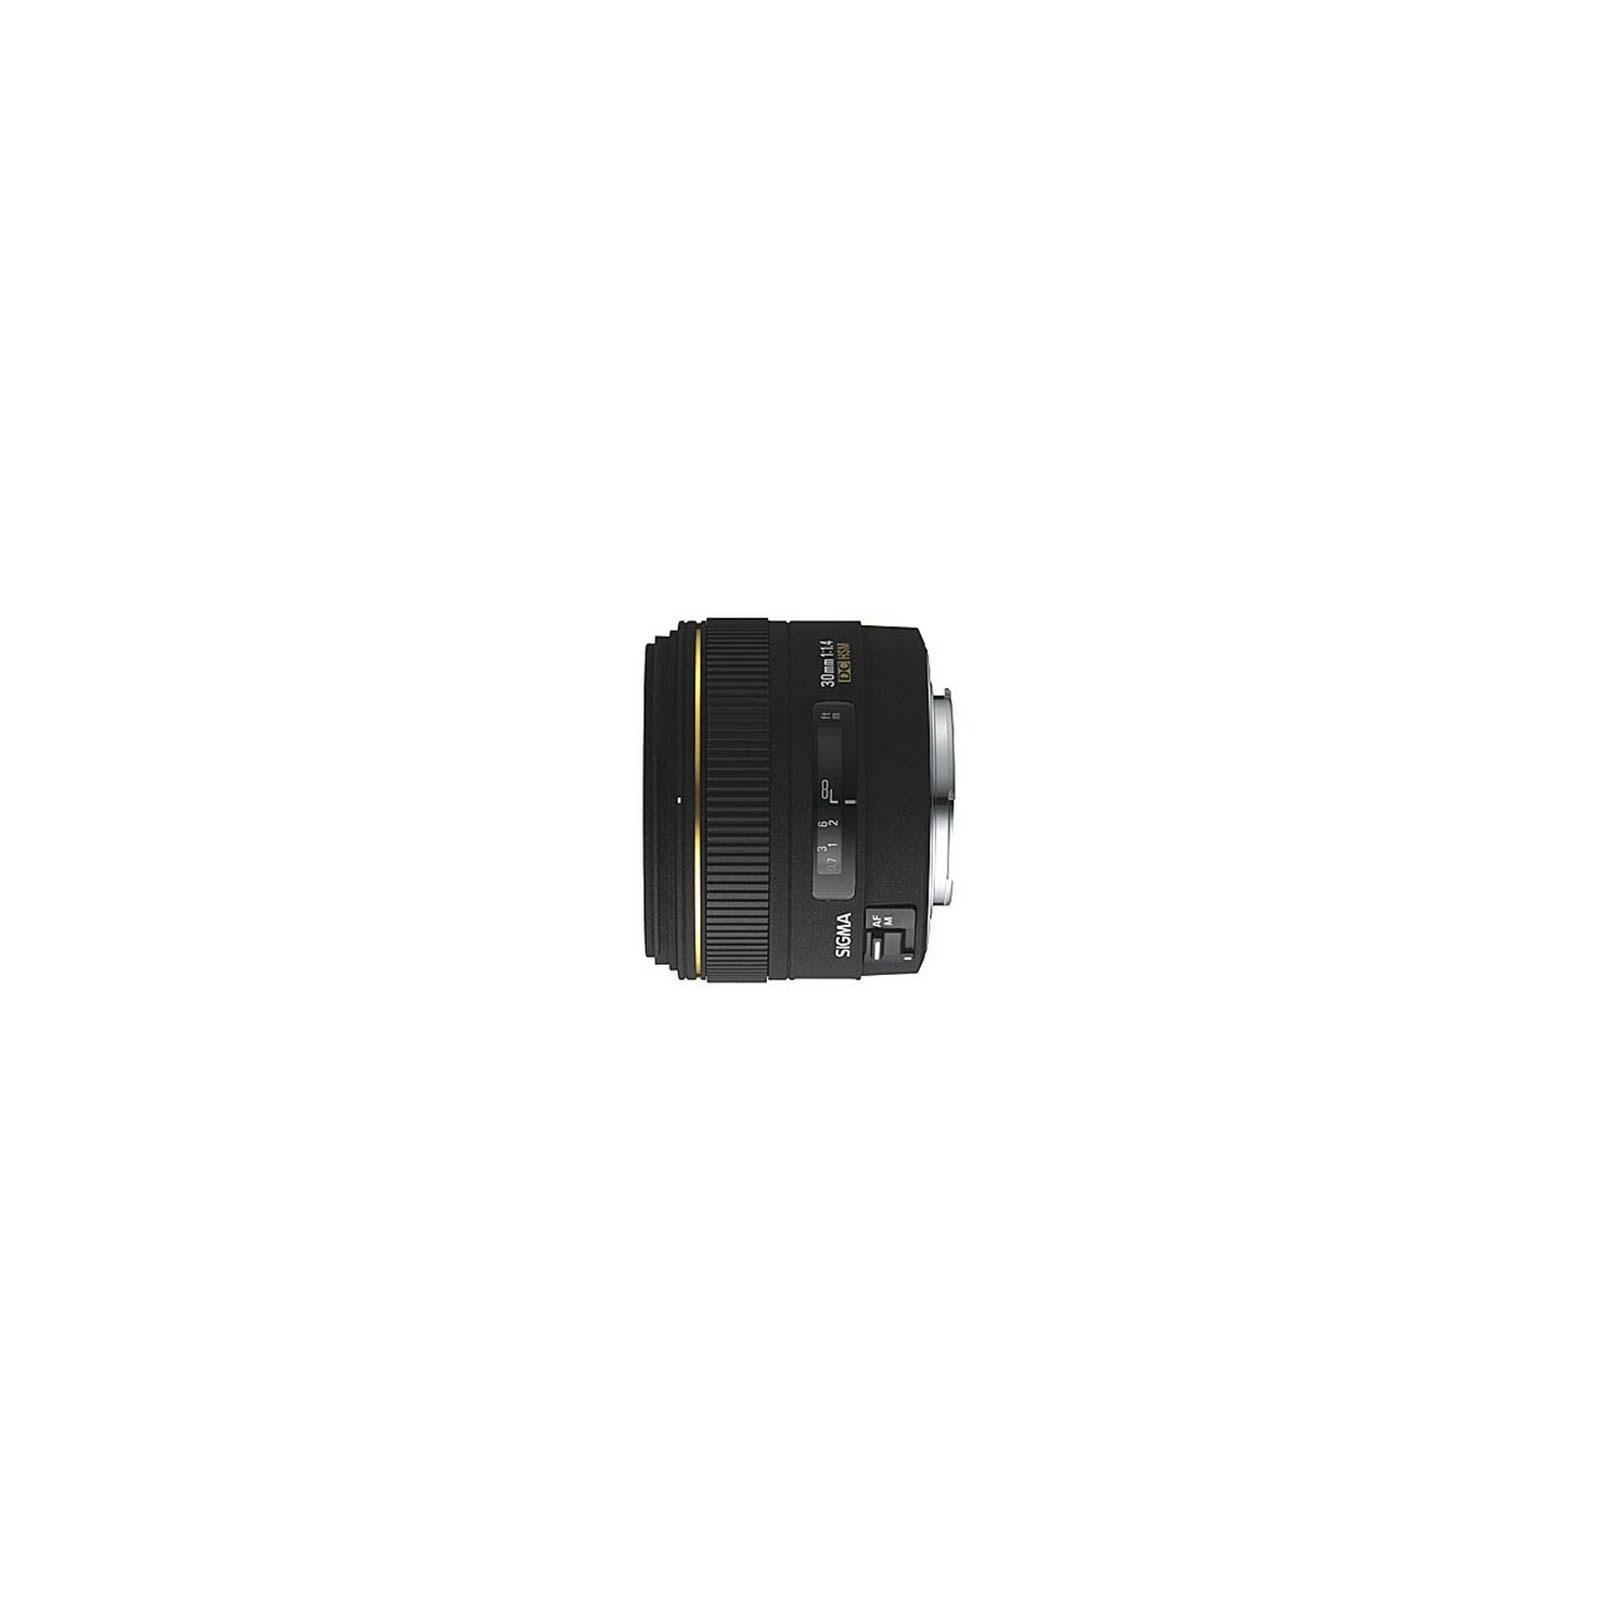 Объектив Sigma 30mm f/1.4 EX DC HSM for Canon (300927)